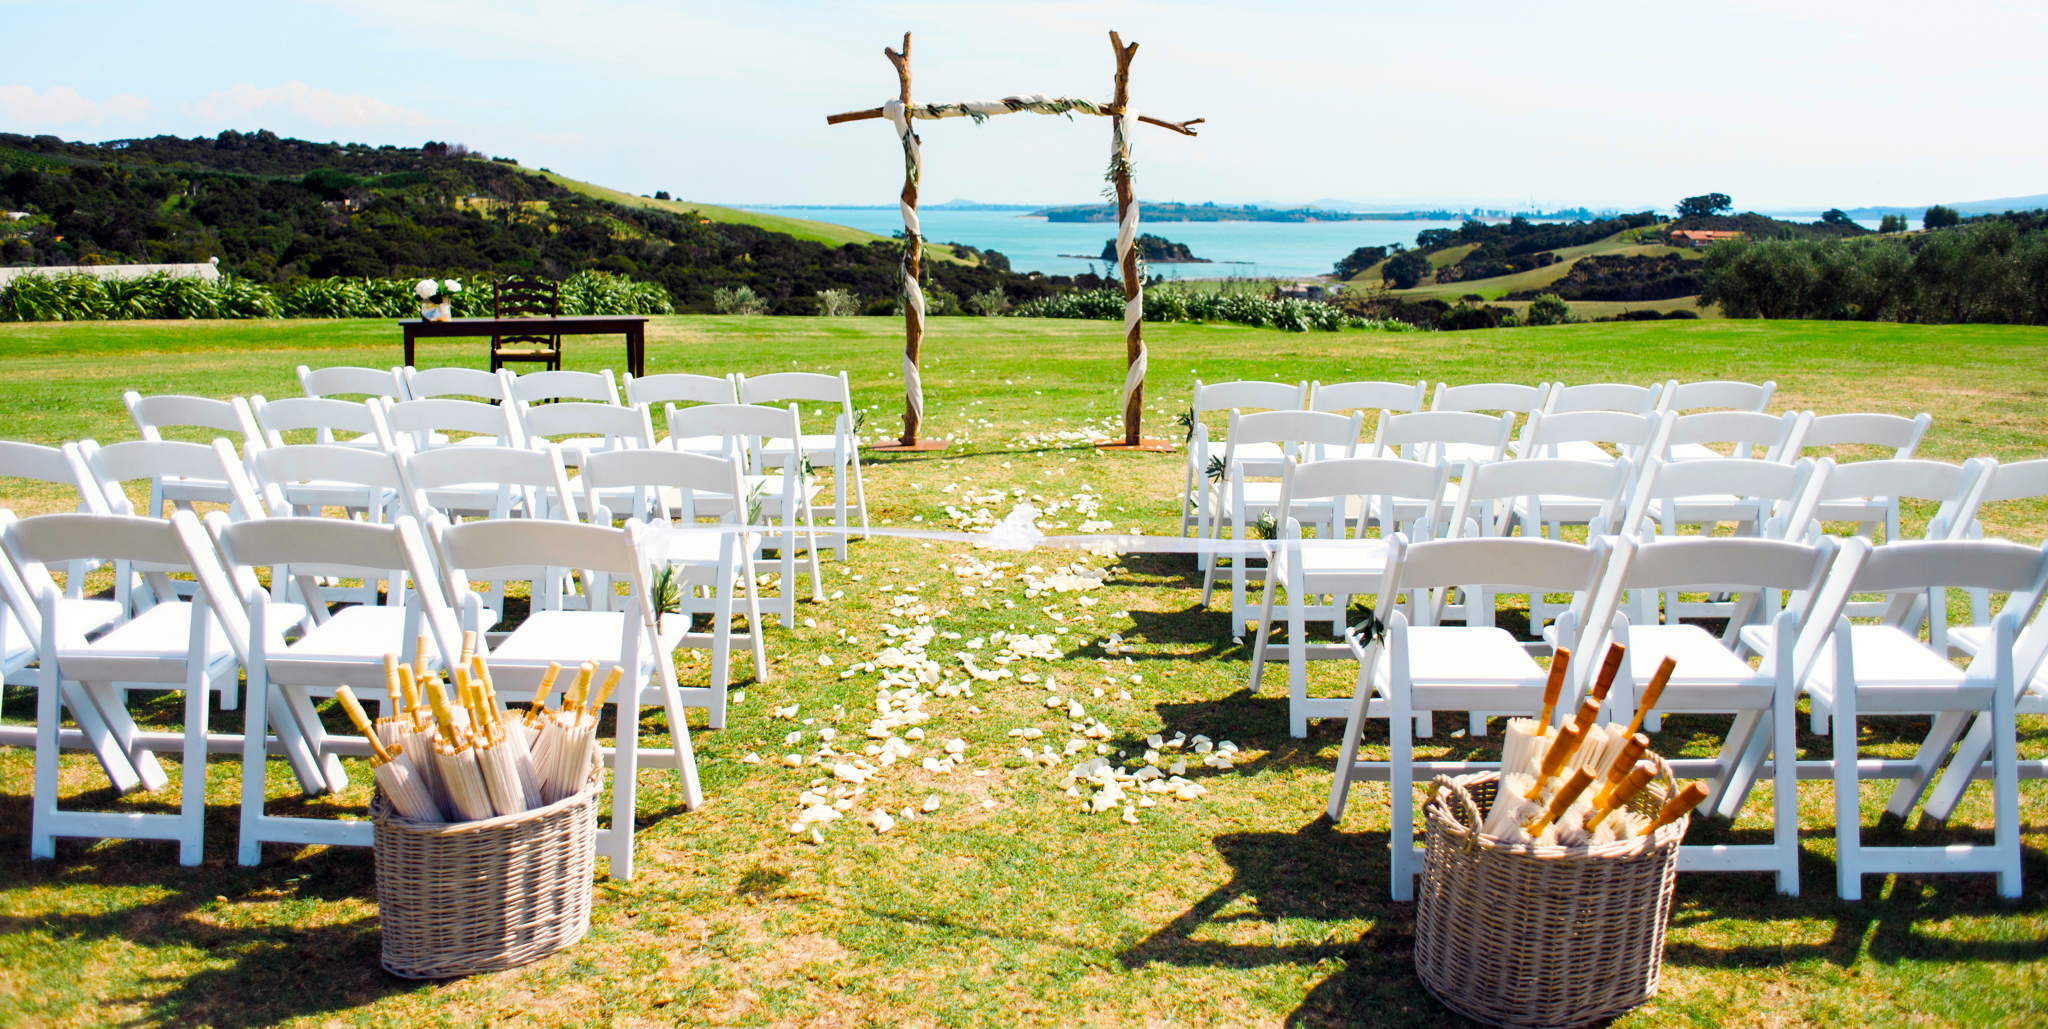 marionhphotography-Wedding-Emma-Glenn-CableBay130216-WEB-149